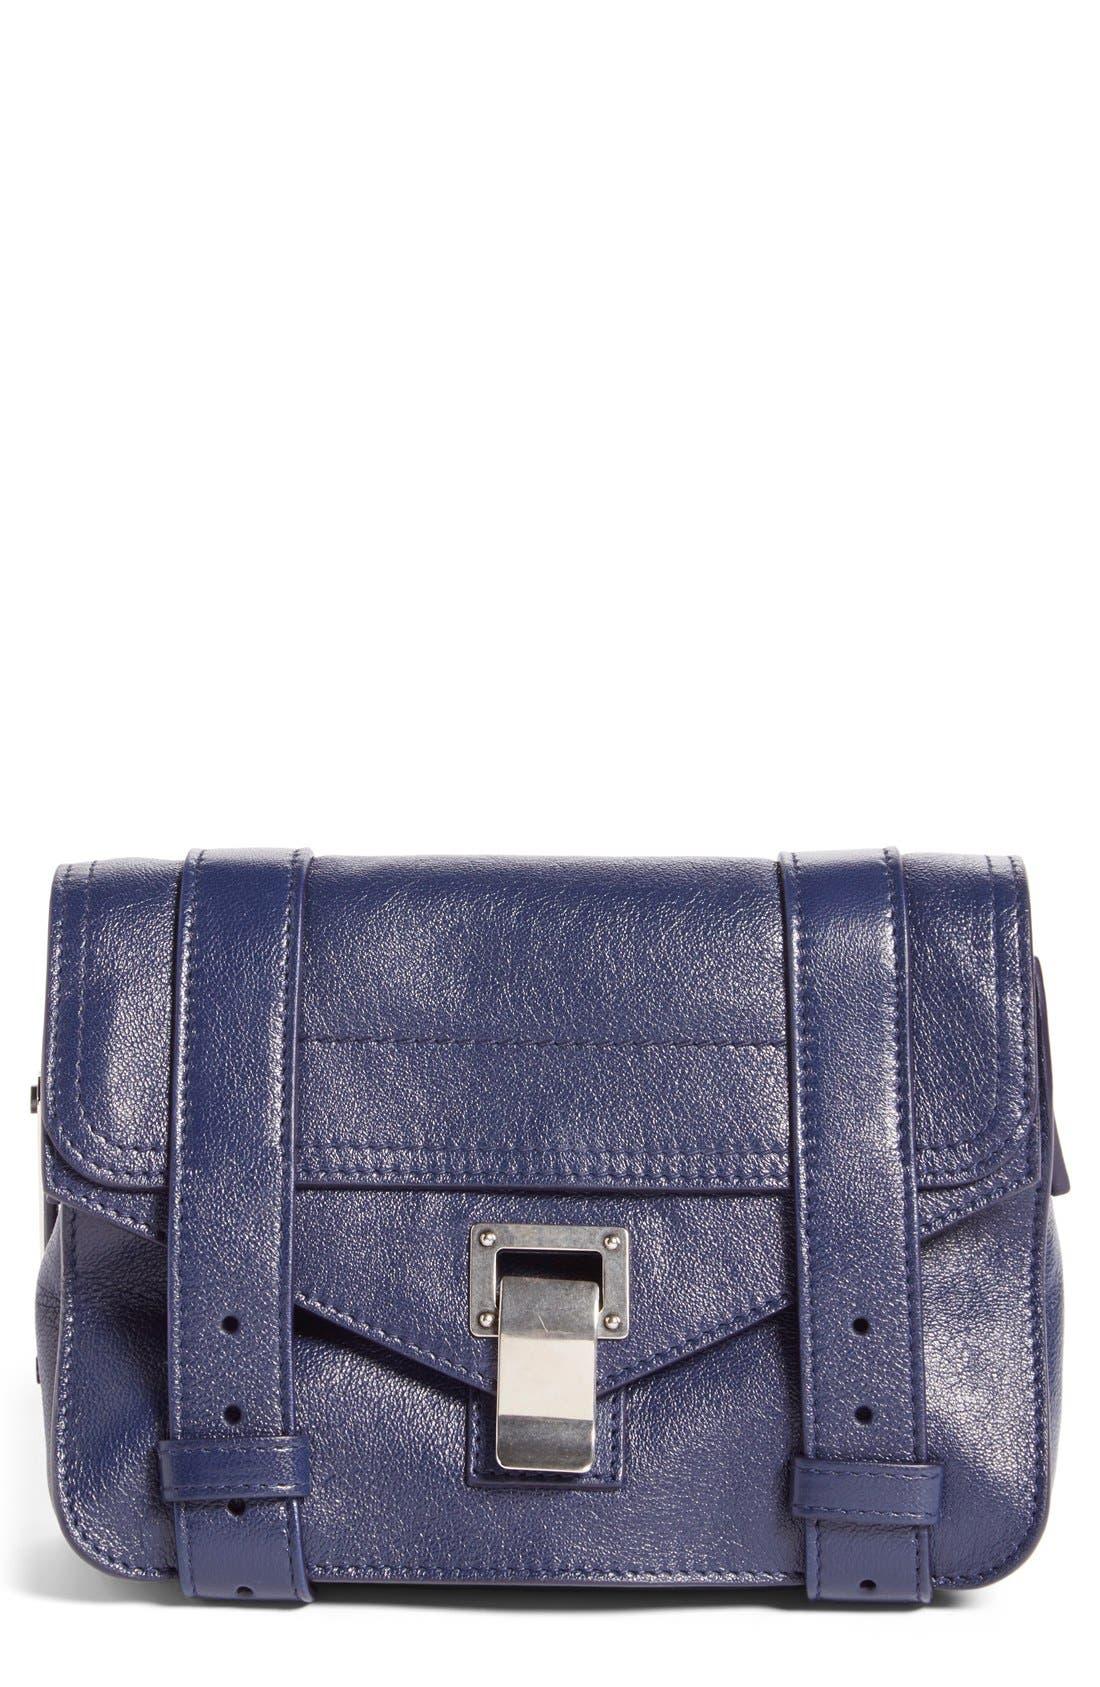 'Mini PS1' Lambskin Leather Crossbody Bag,                             Main thumbnail 2, color,